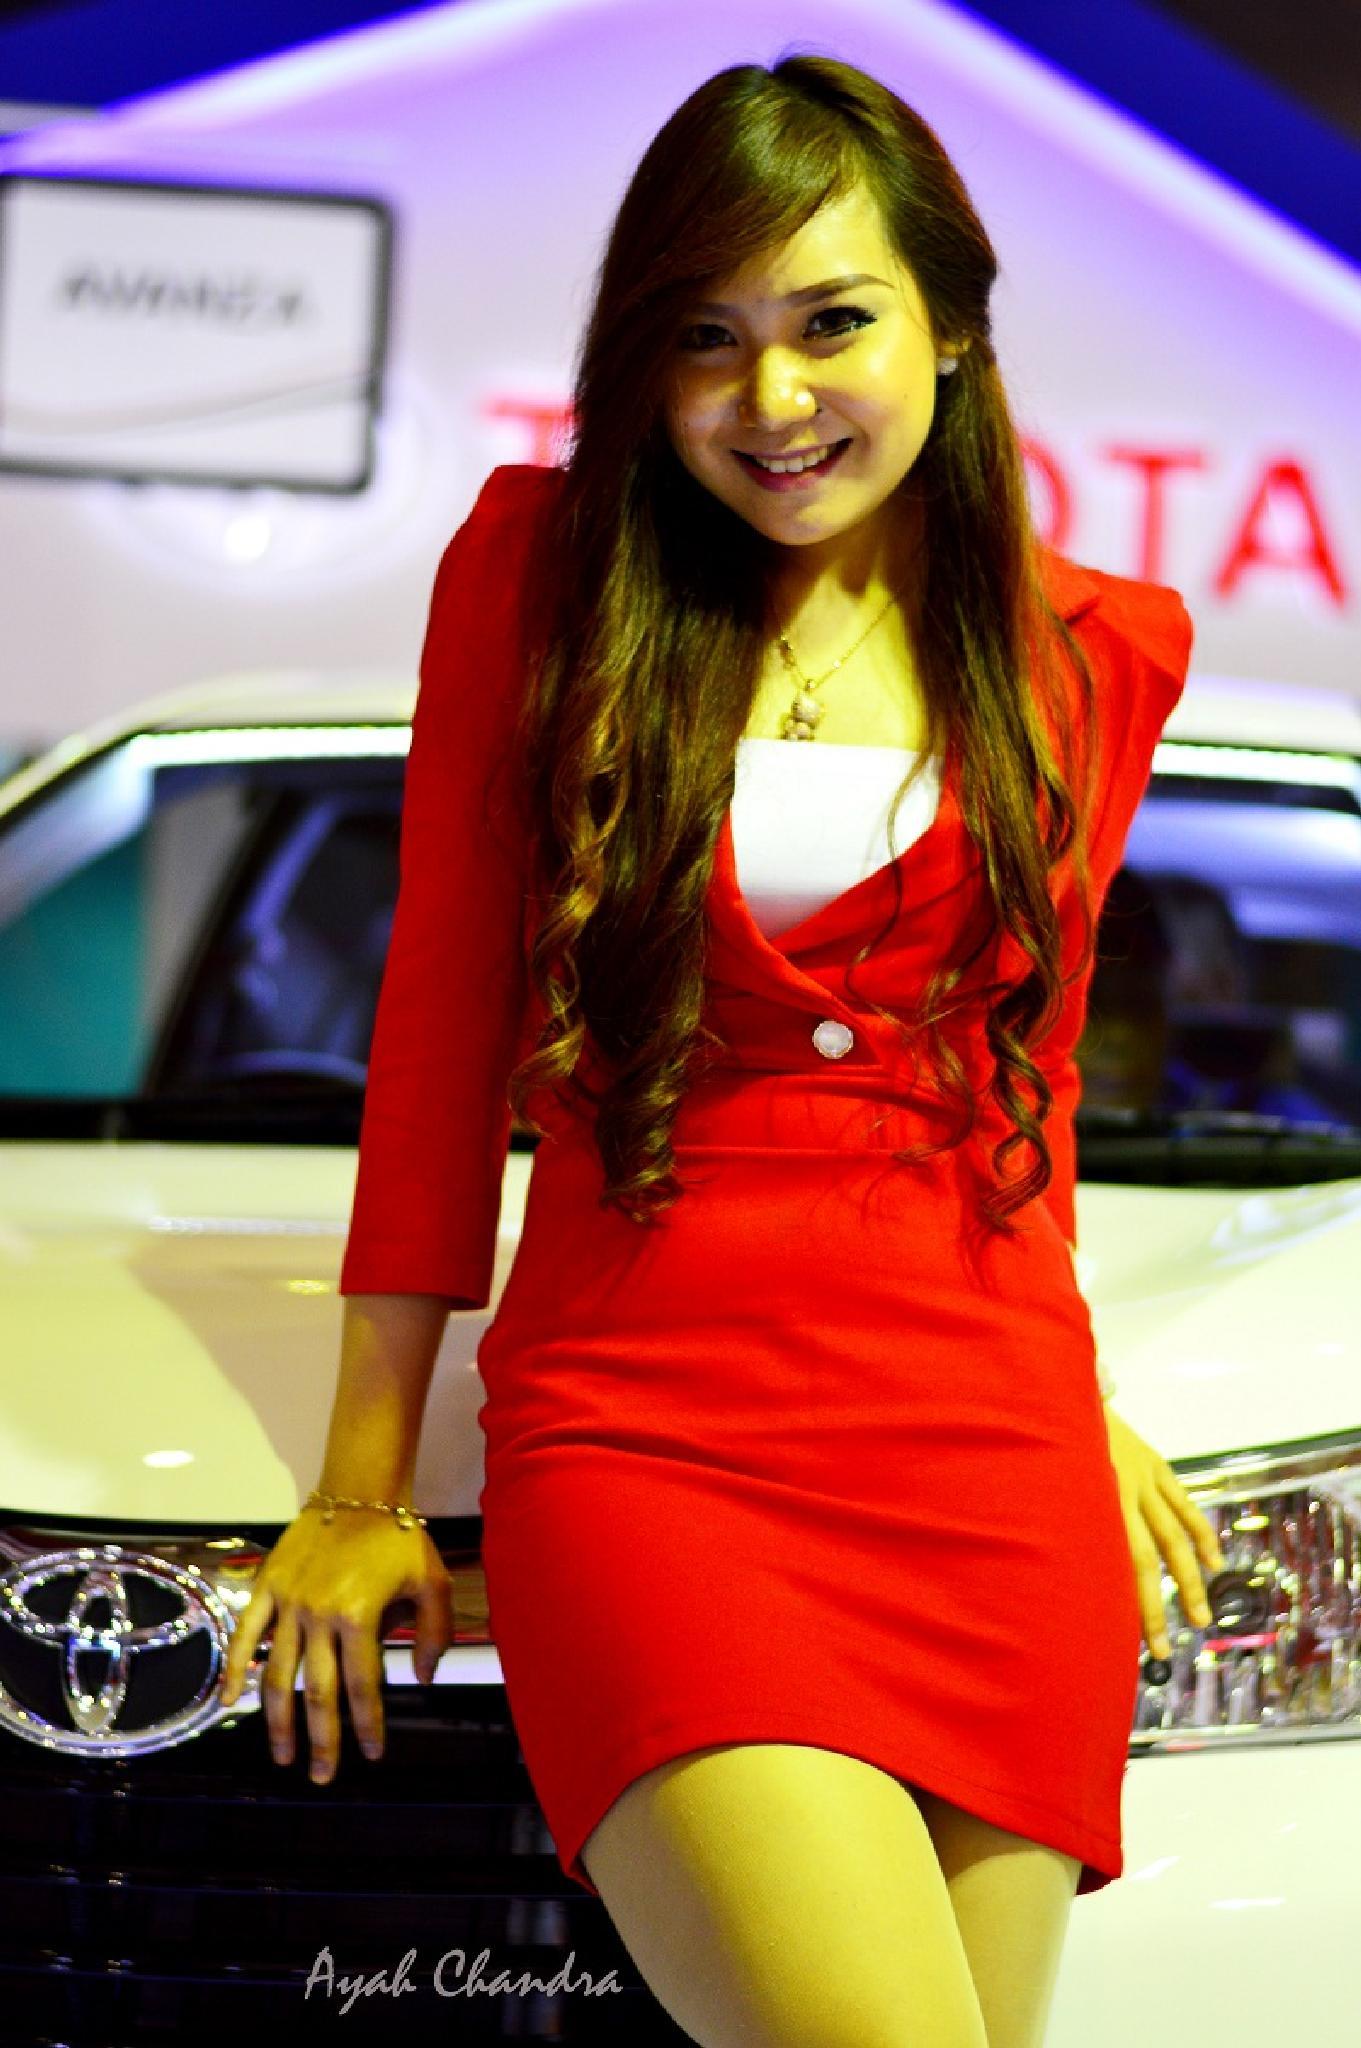 my girl by Chandra (ayah chandra)